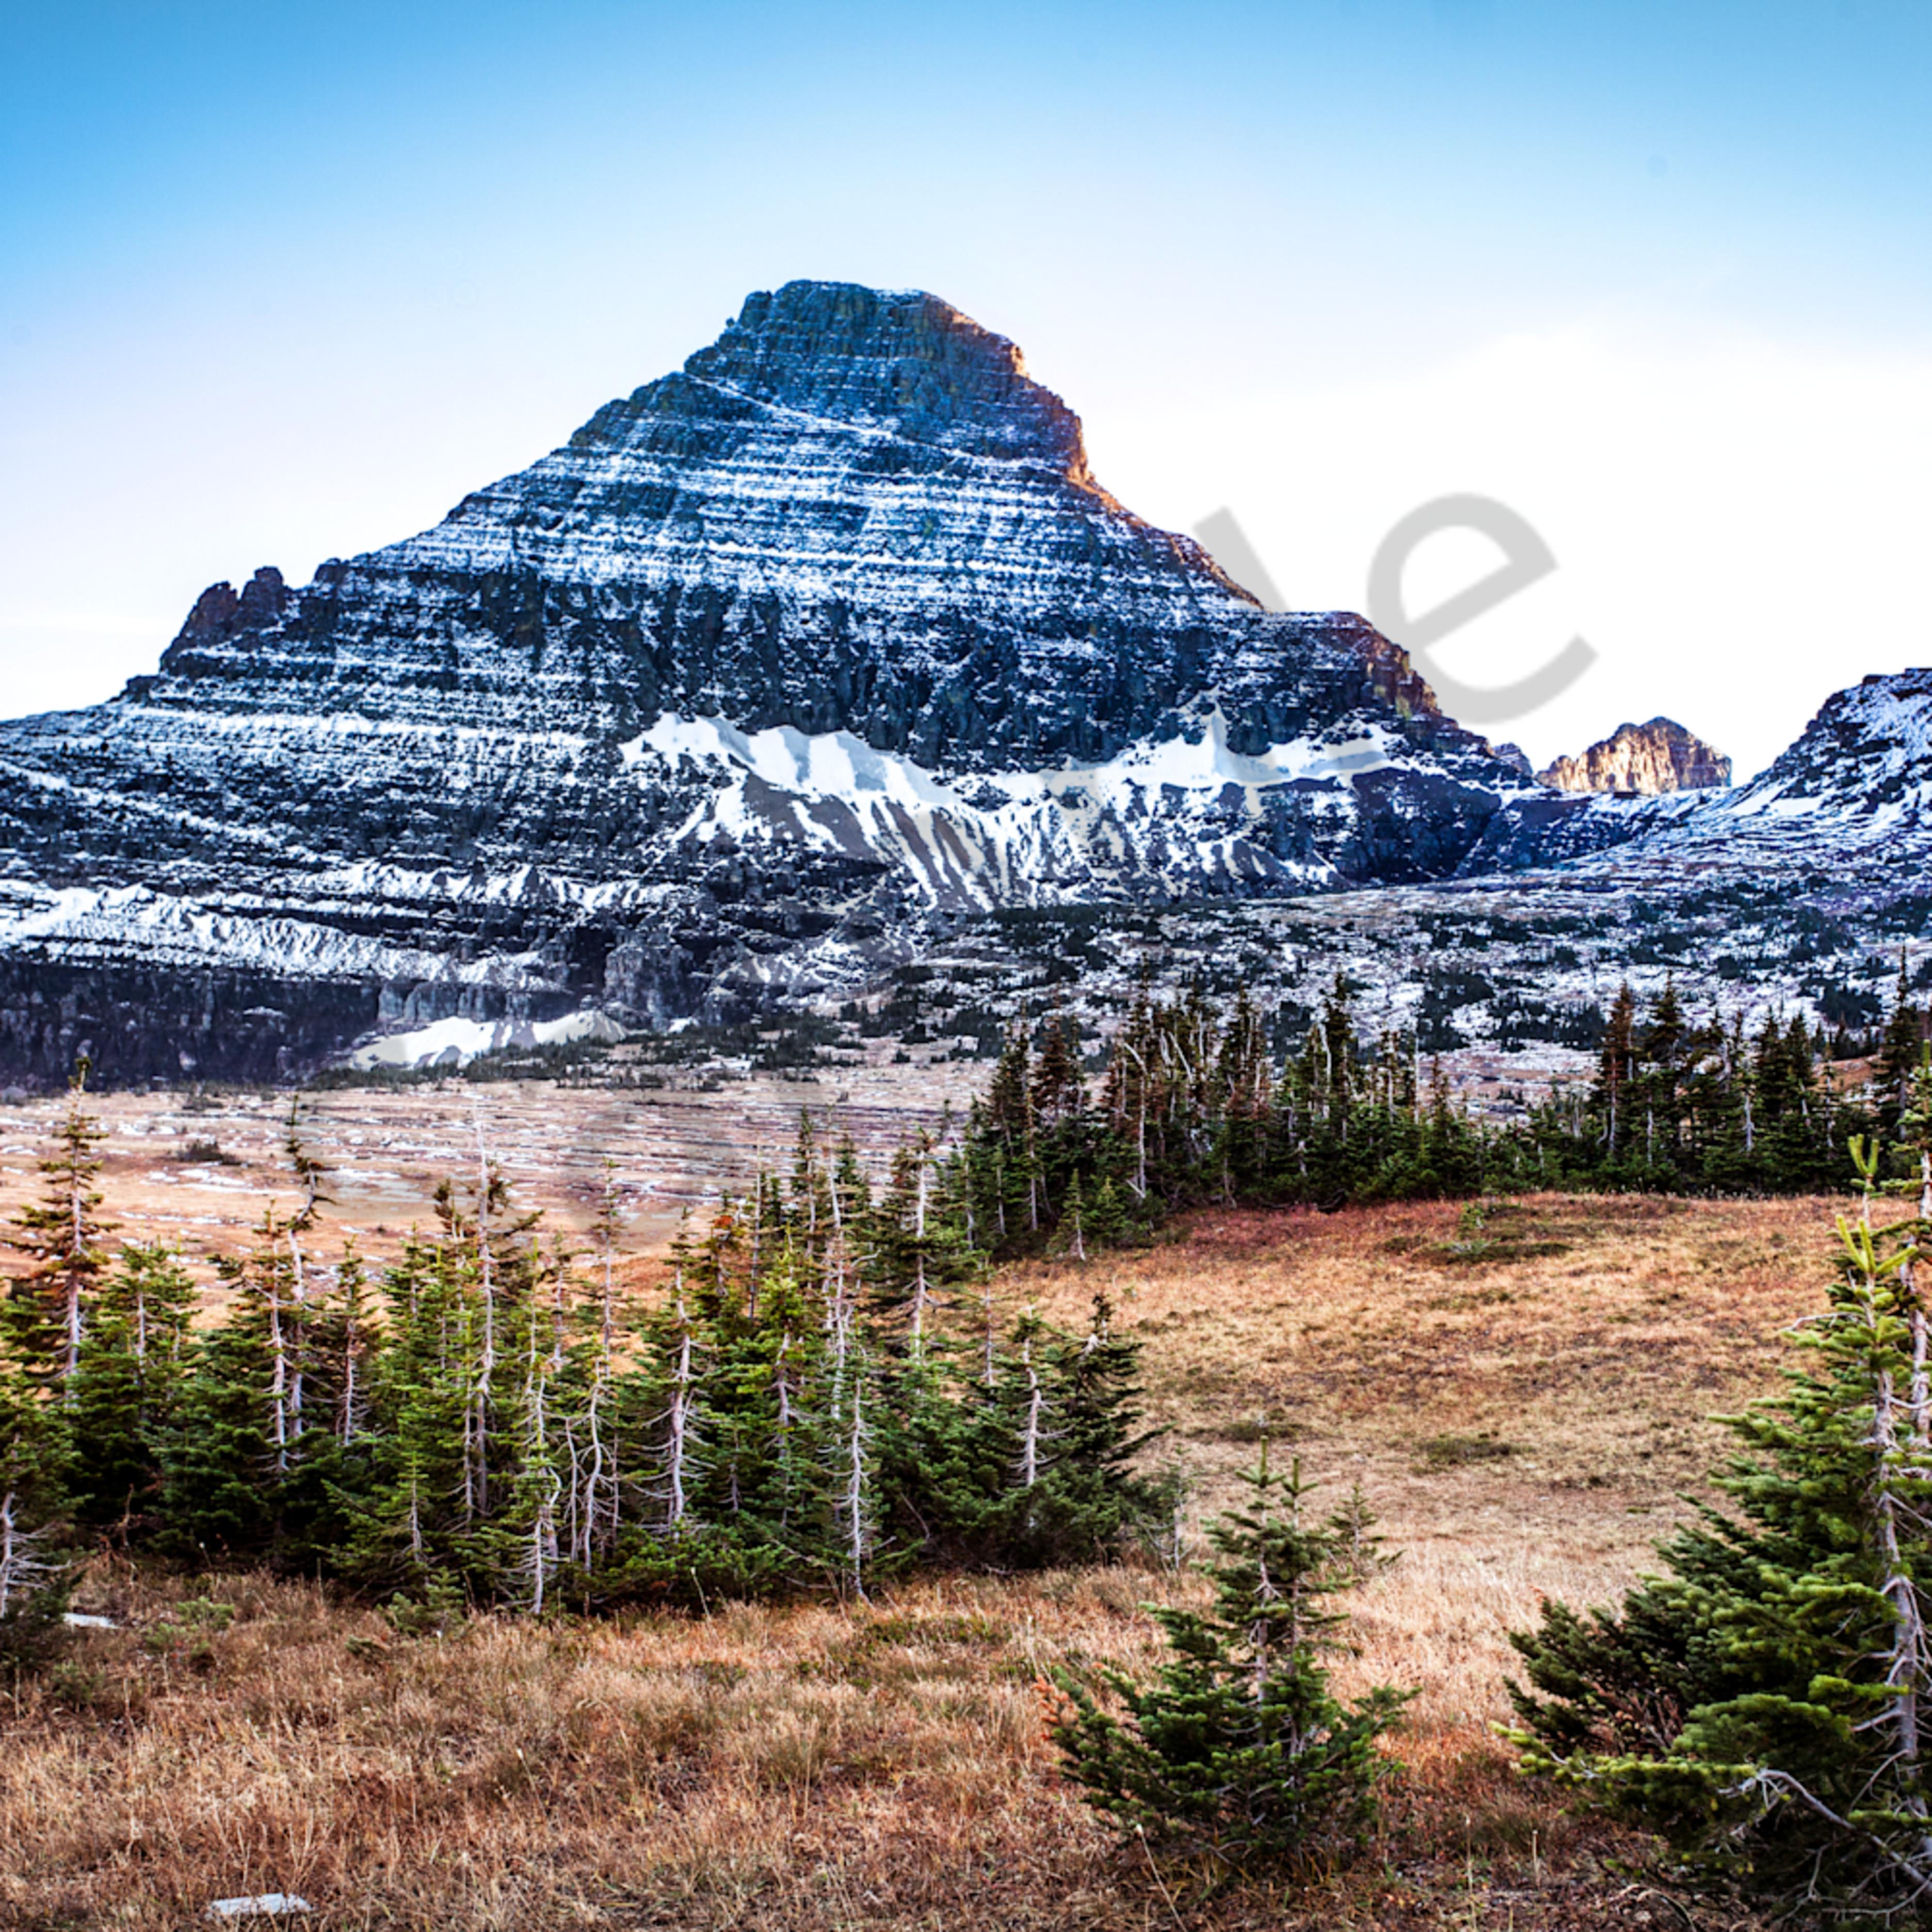 Montana mountains trees snowpeaks sunset nationalpark horizontal wp9ycz